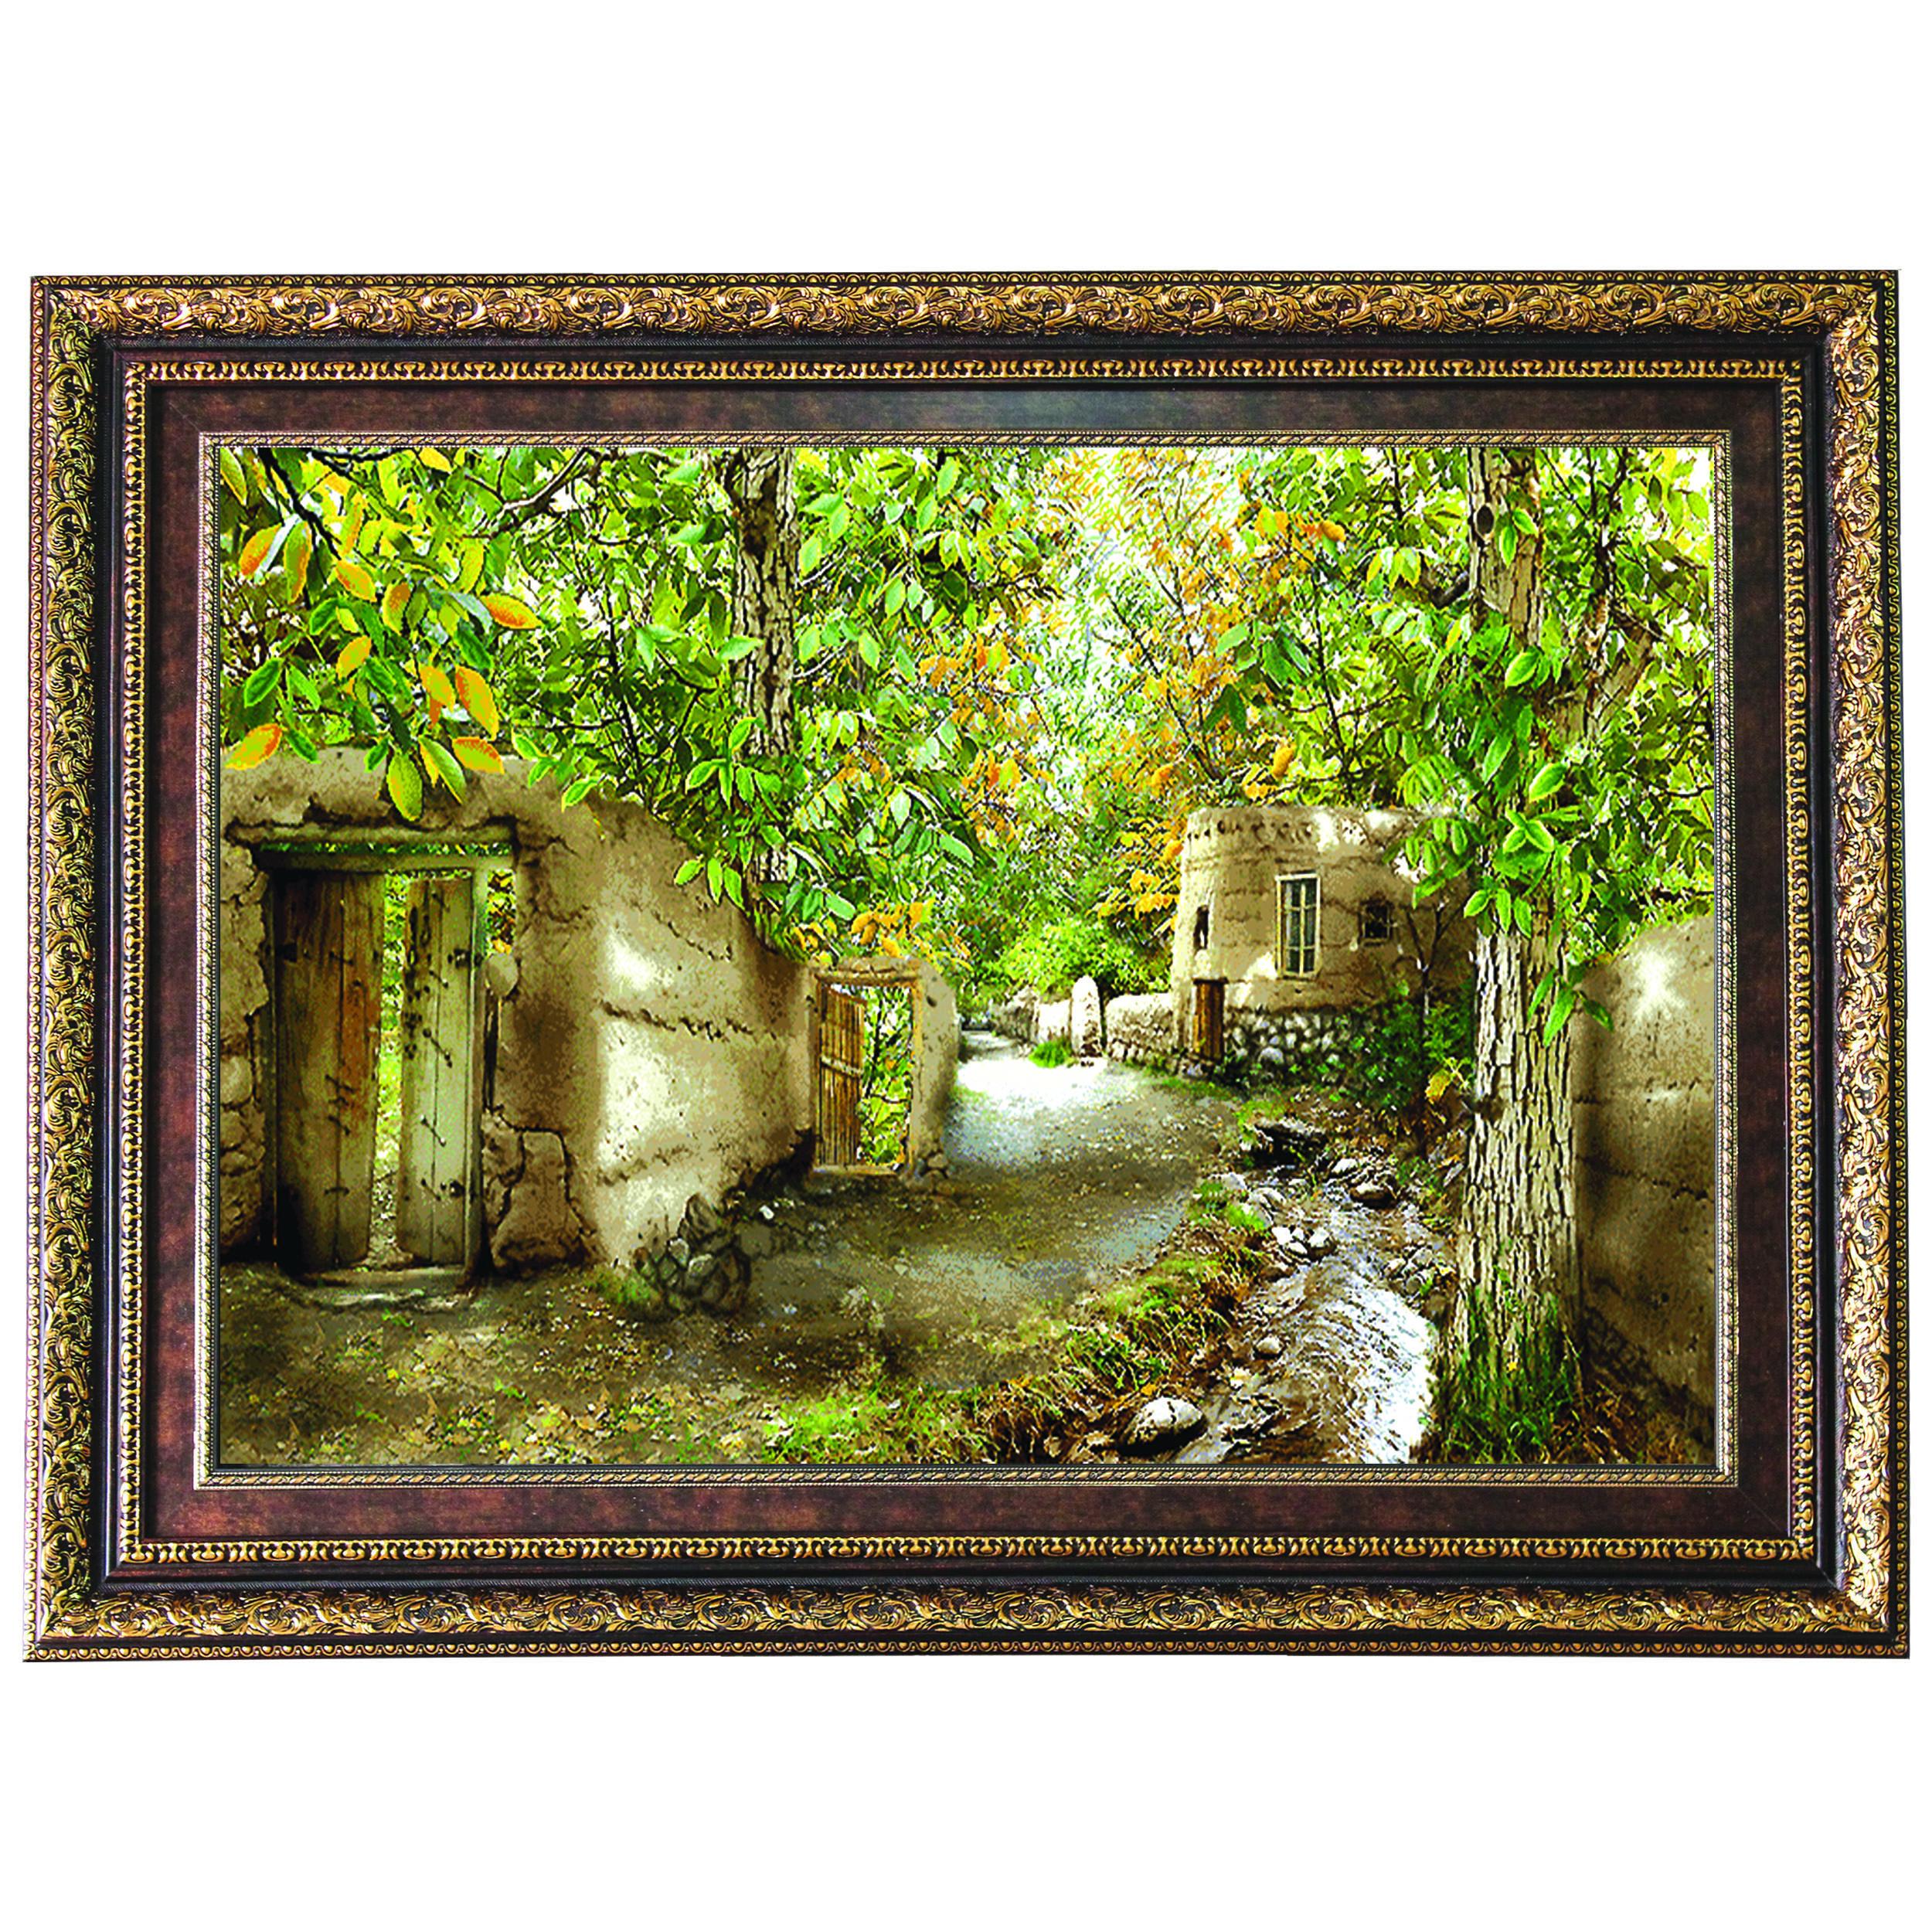 تابلو فرش ماشینی طرح کوچه باغ کد FL1882